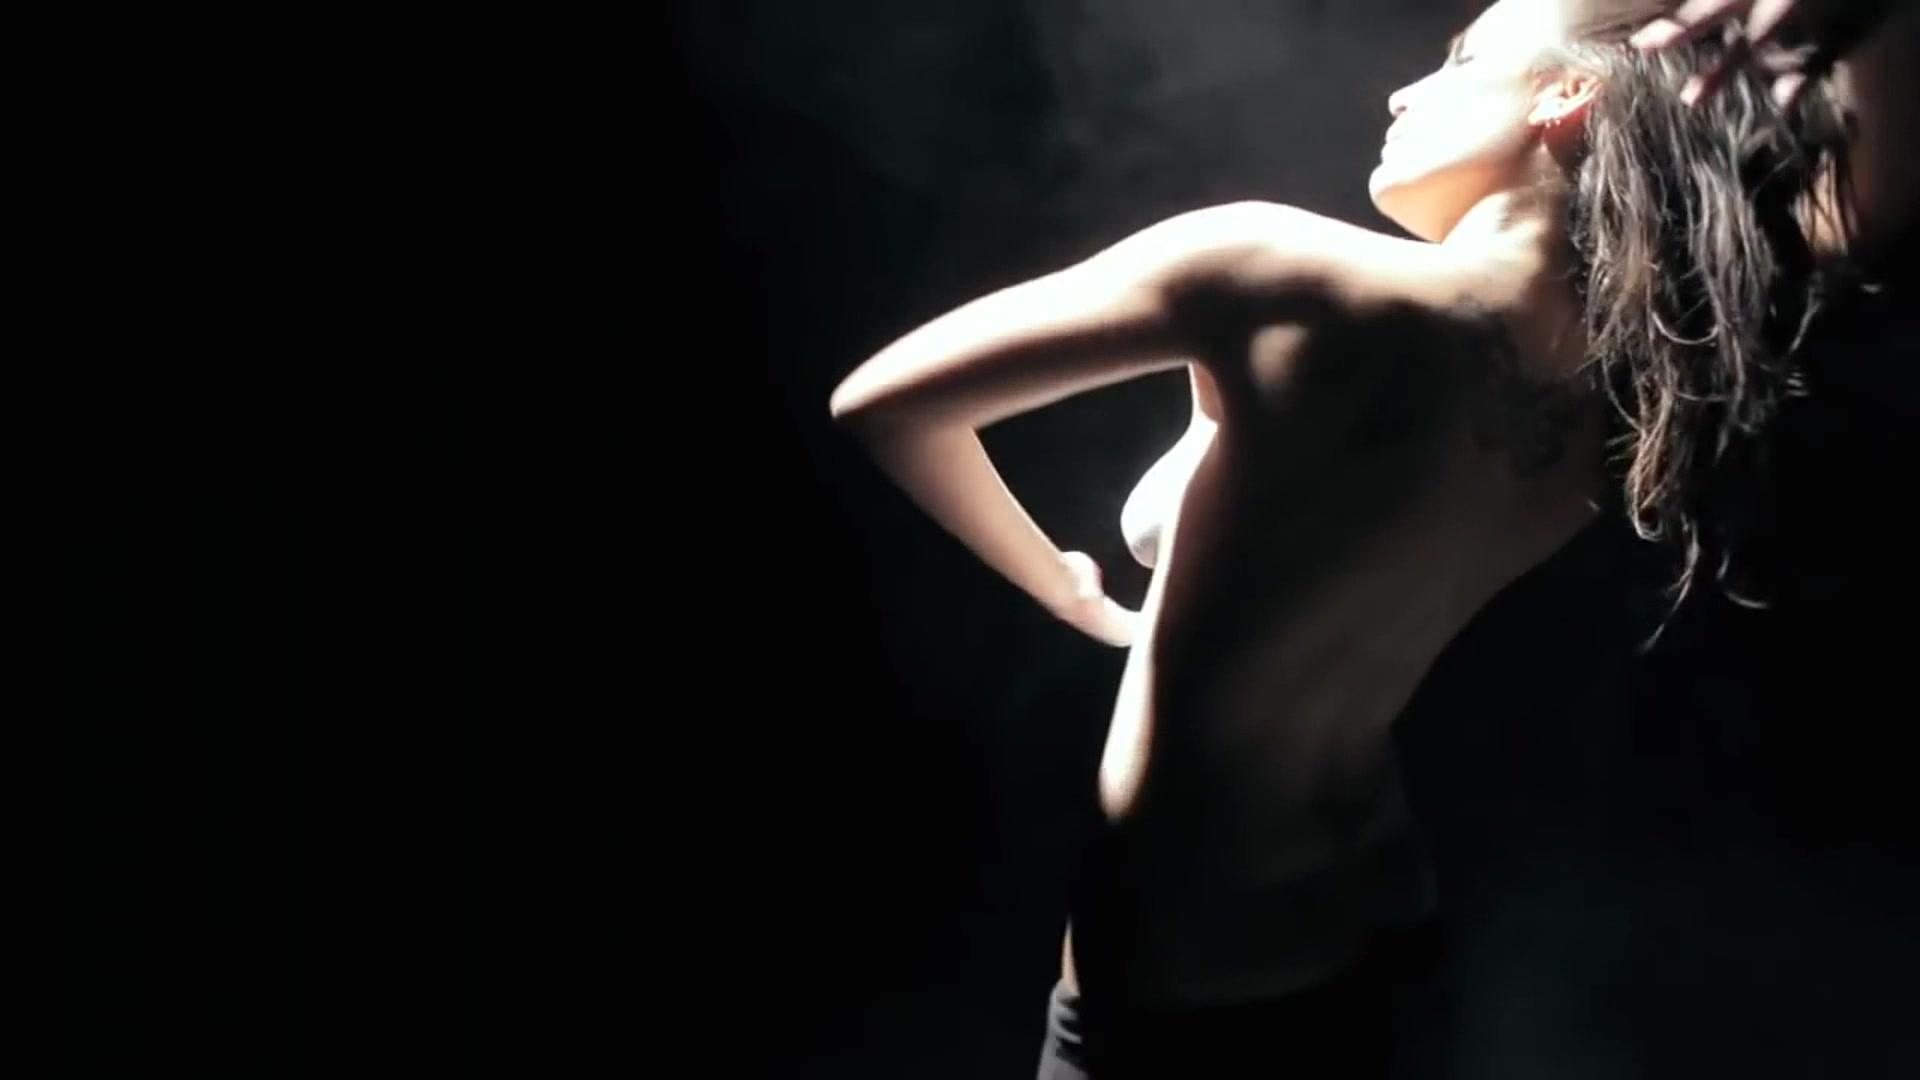 Naked On Stage - Naked Flamenco Dance  Nude Celebs Tube-1140